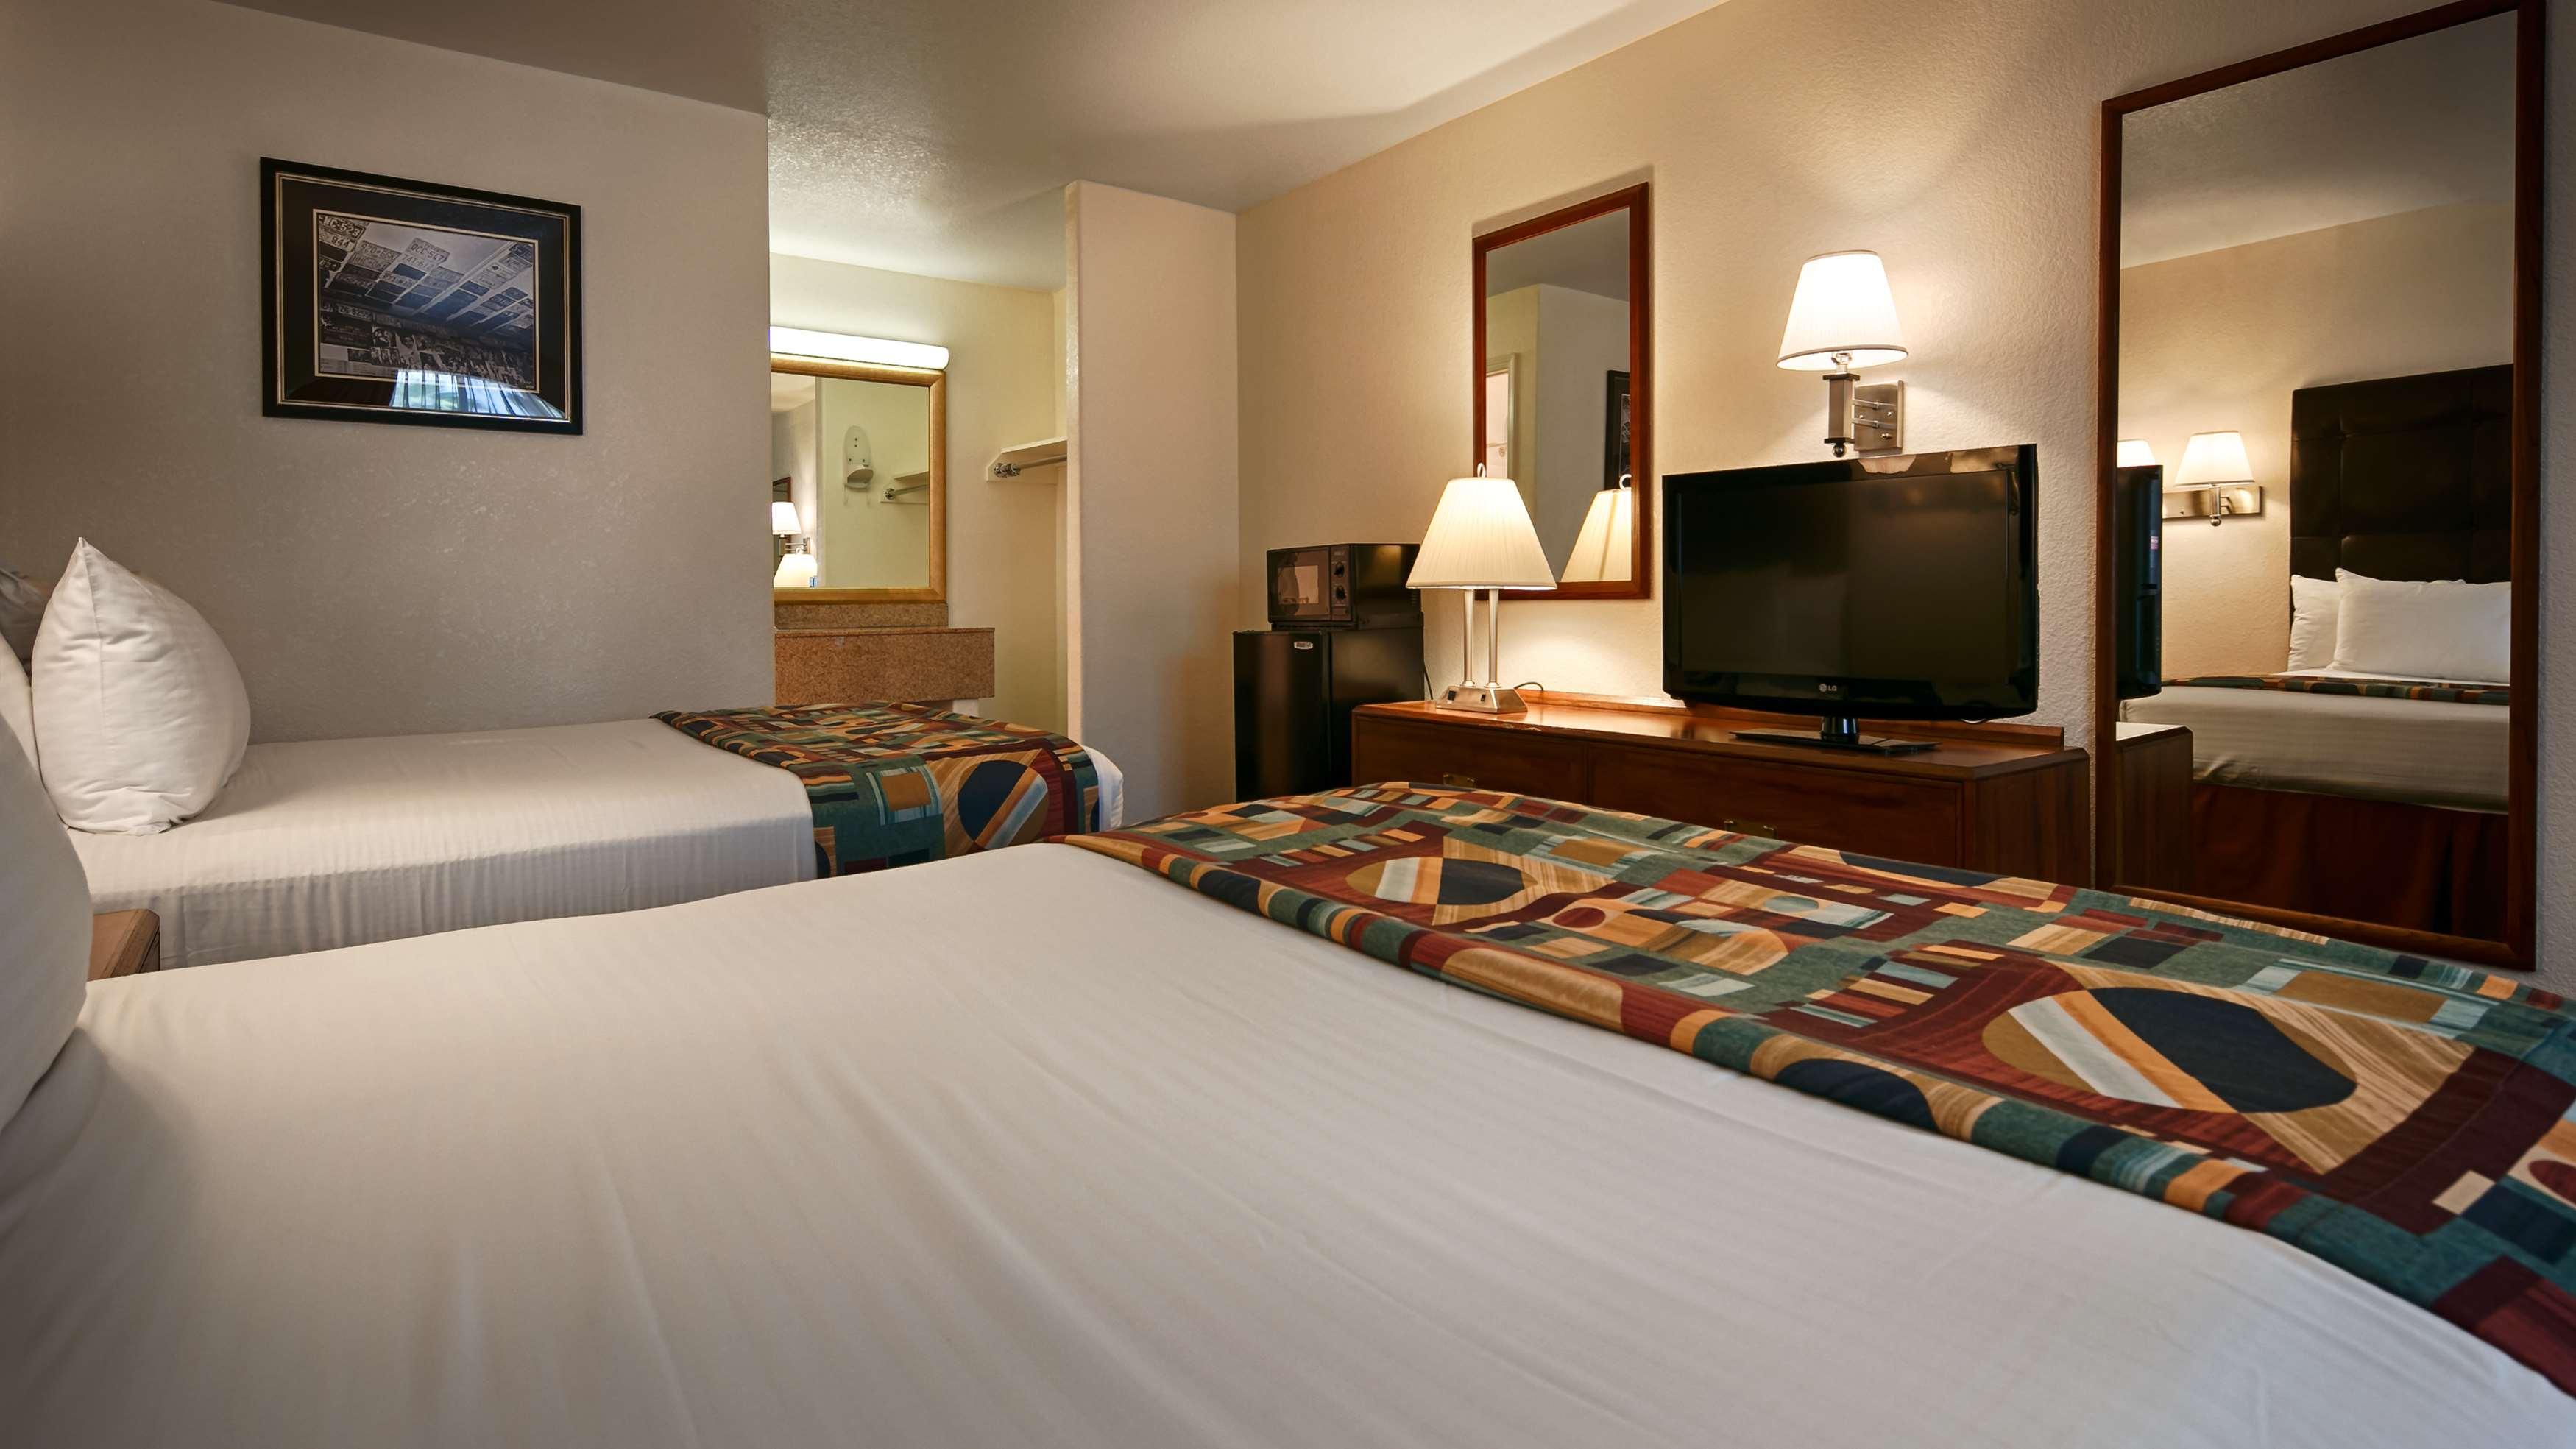 Best Western Colorado River Inn image 10